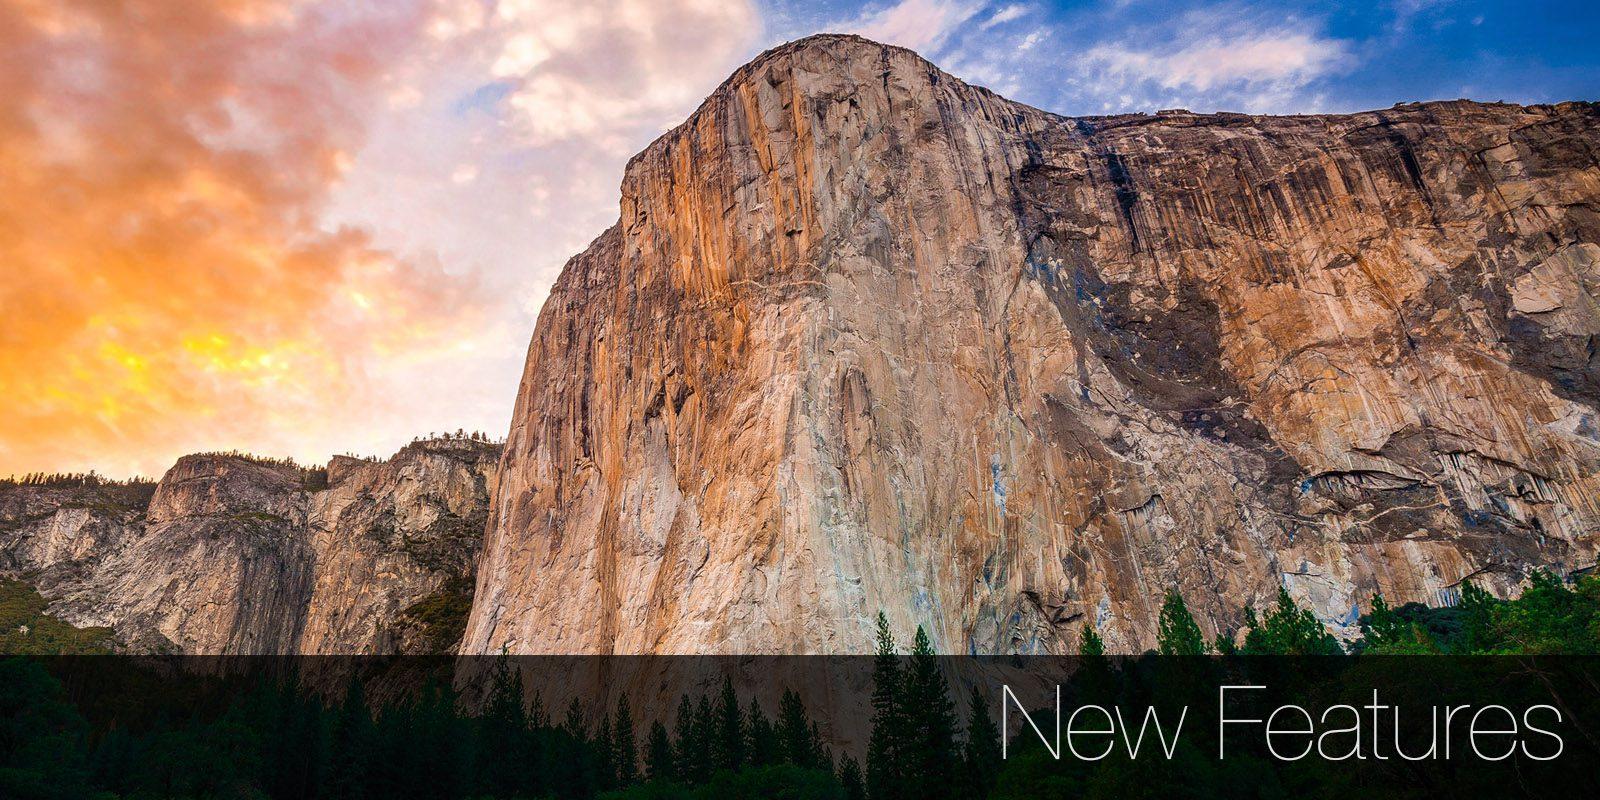 New Features in OS X El Capitan